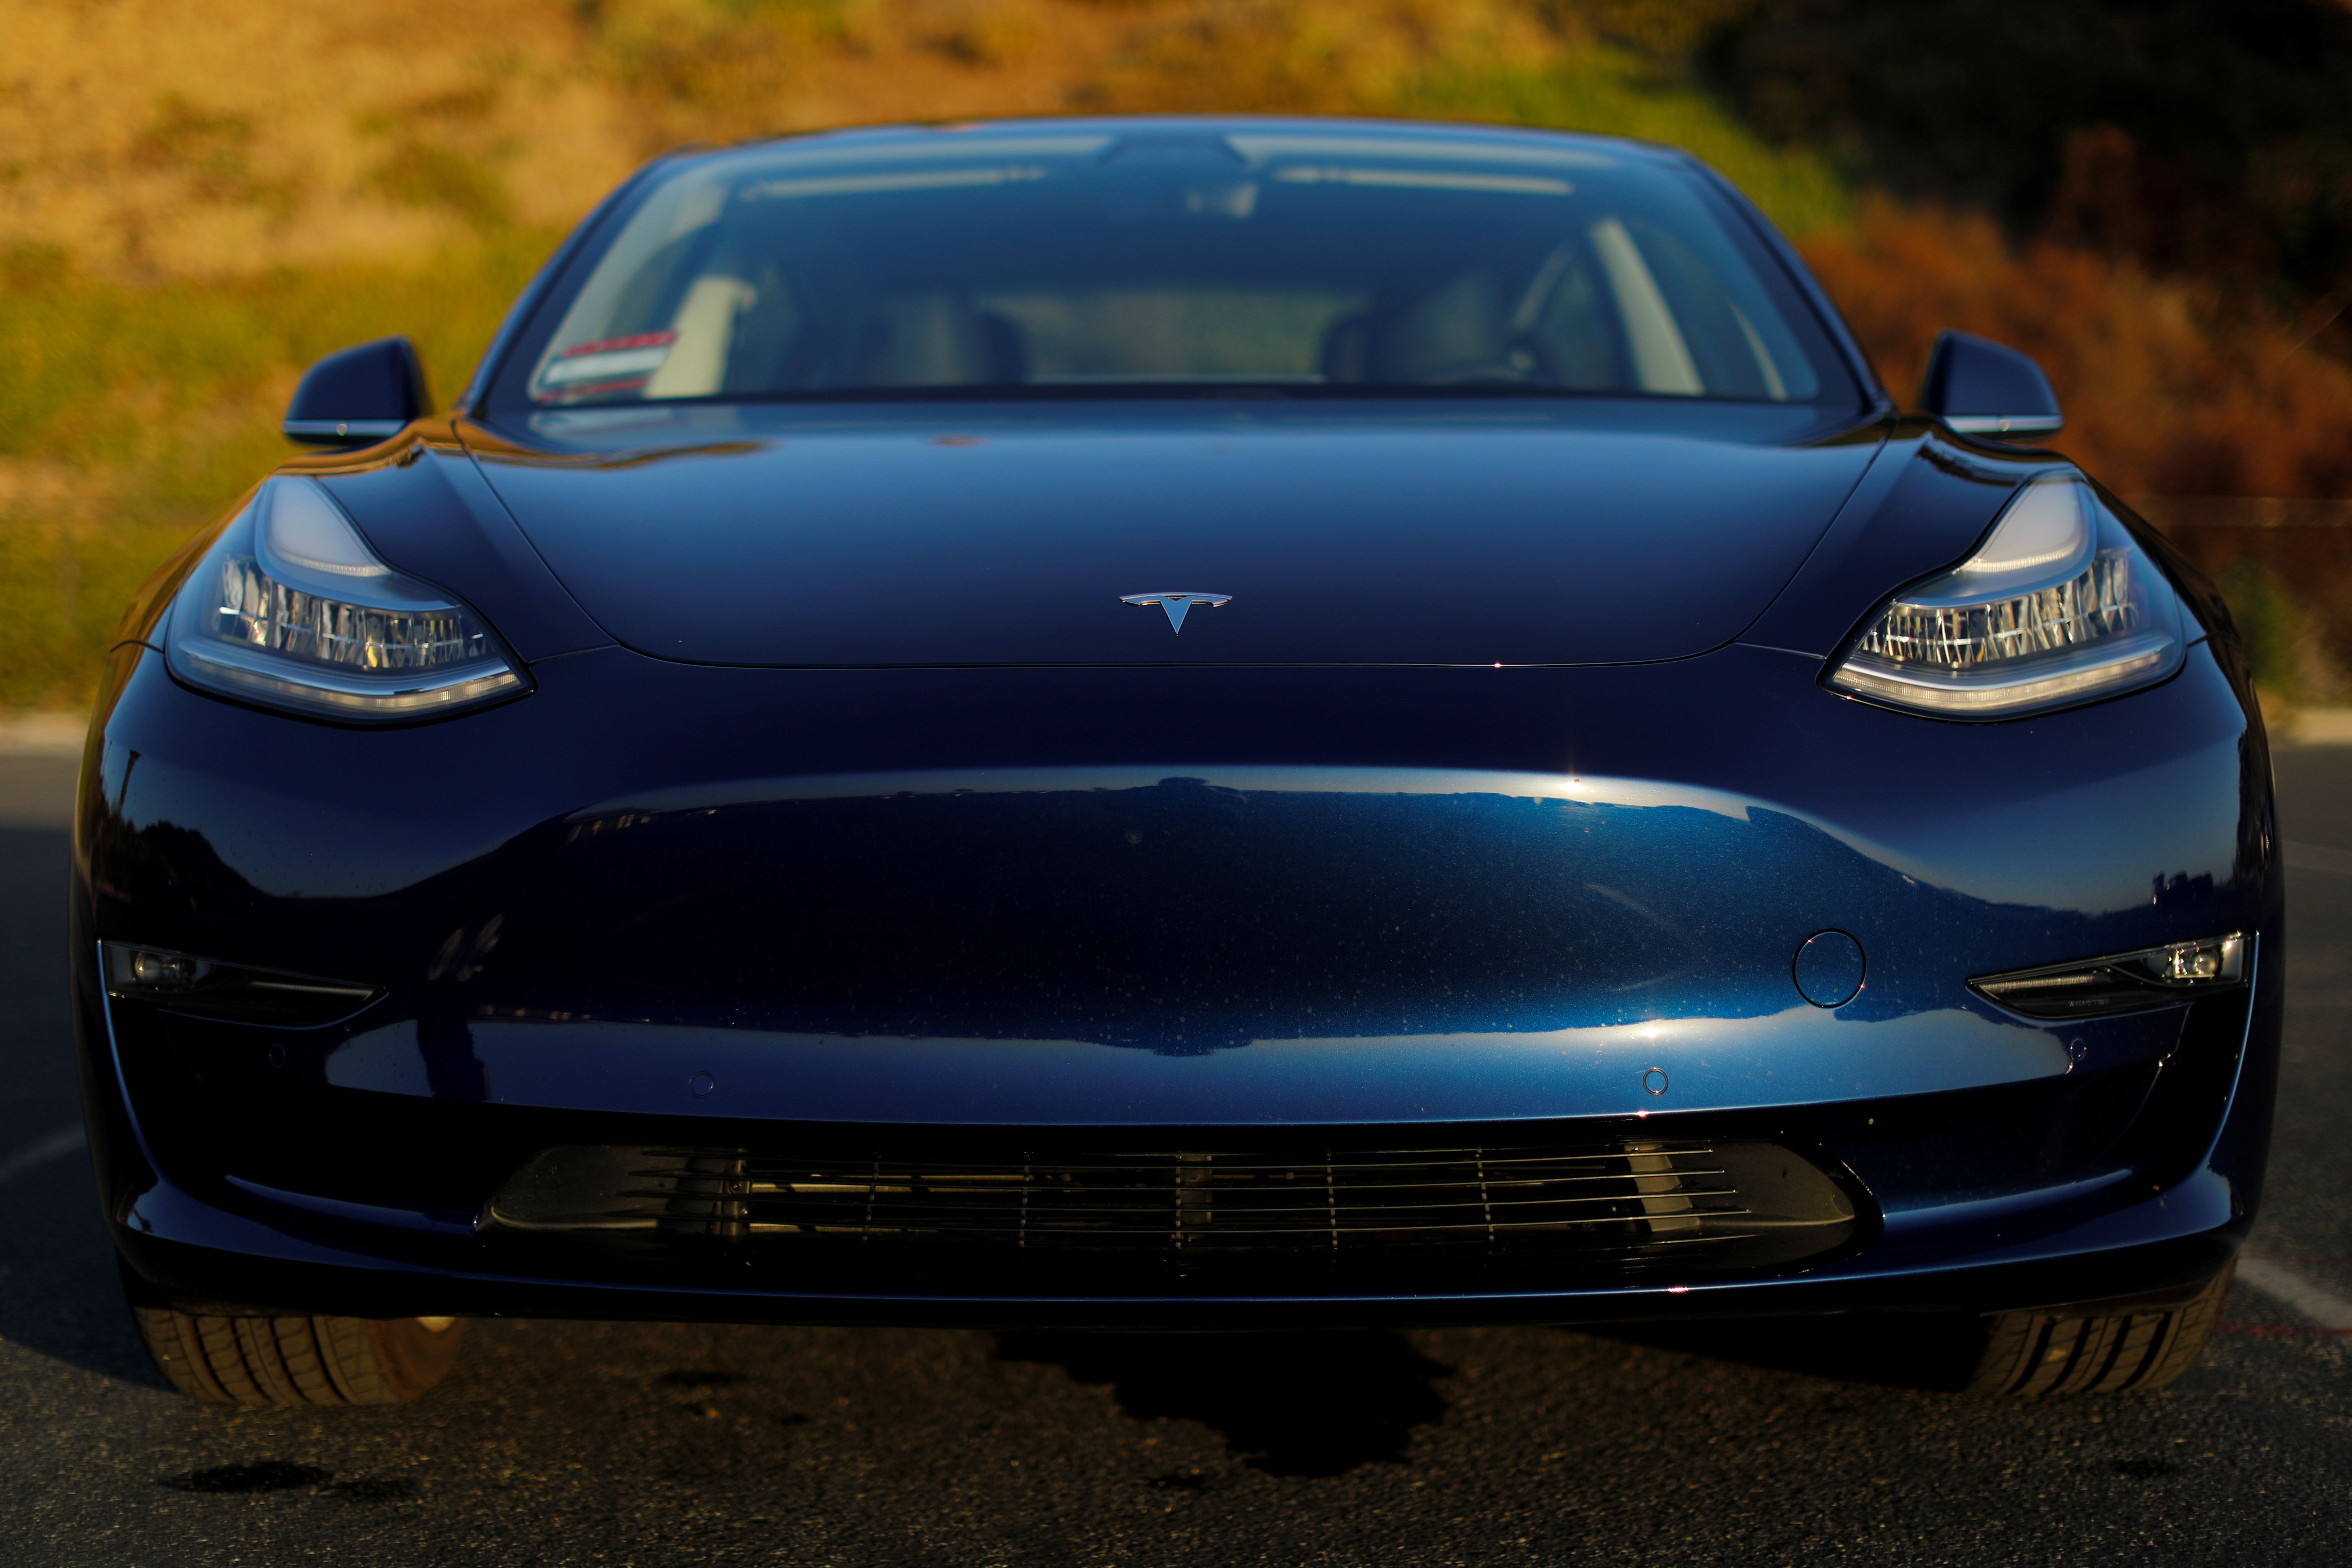 By Alexandria Sage SAN FRANCISCO Reuters Tesla Inc said on Friday